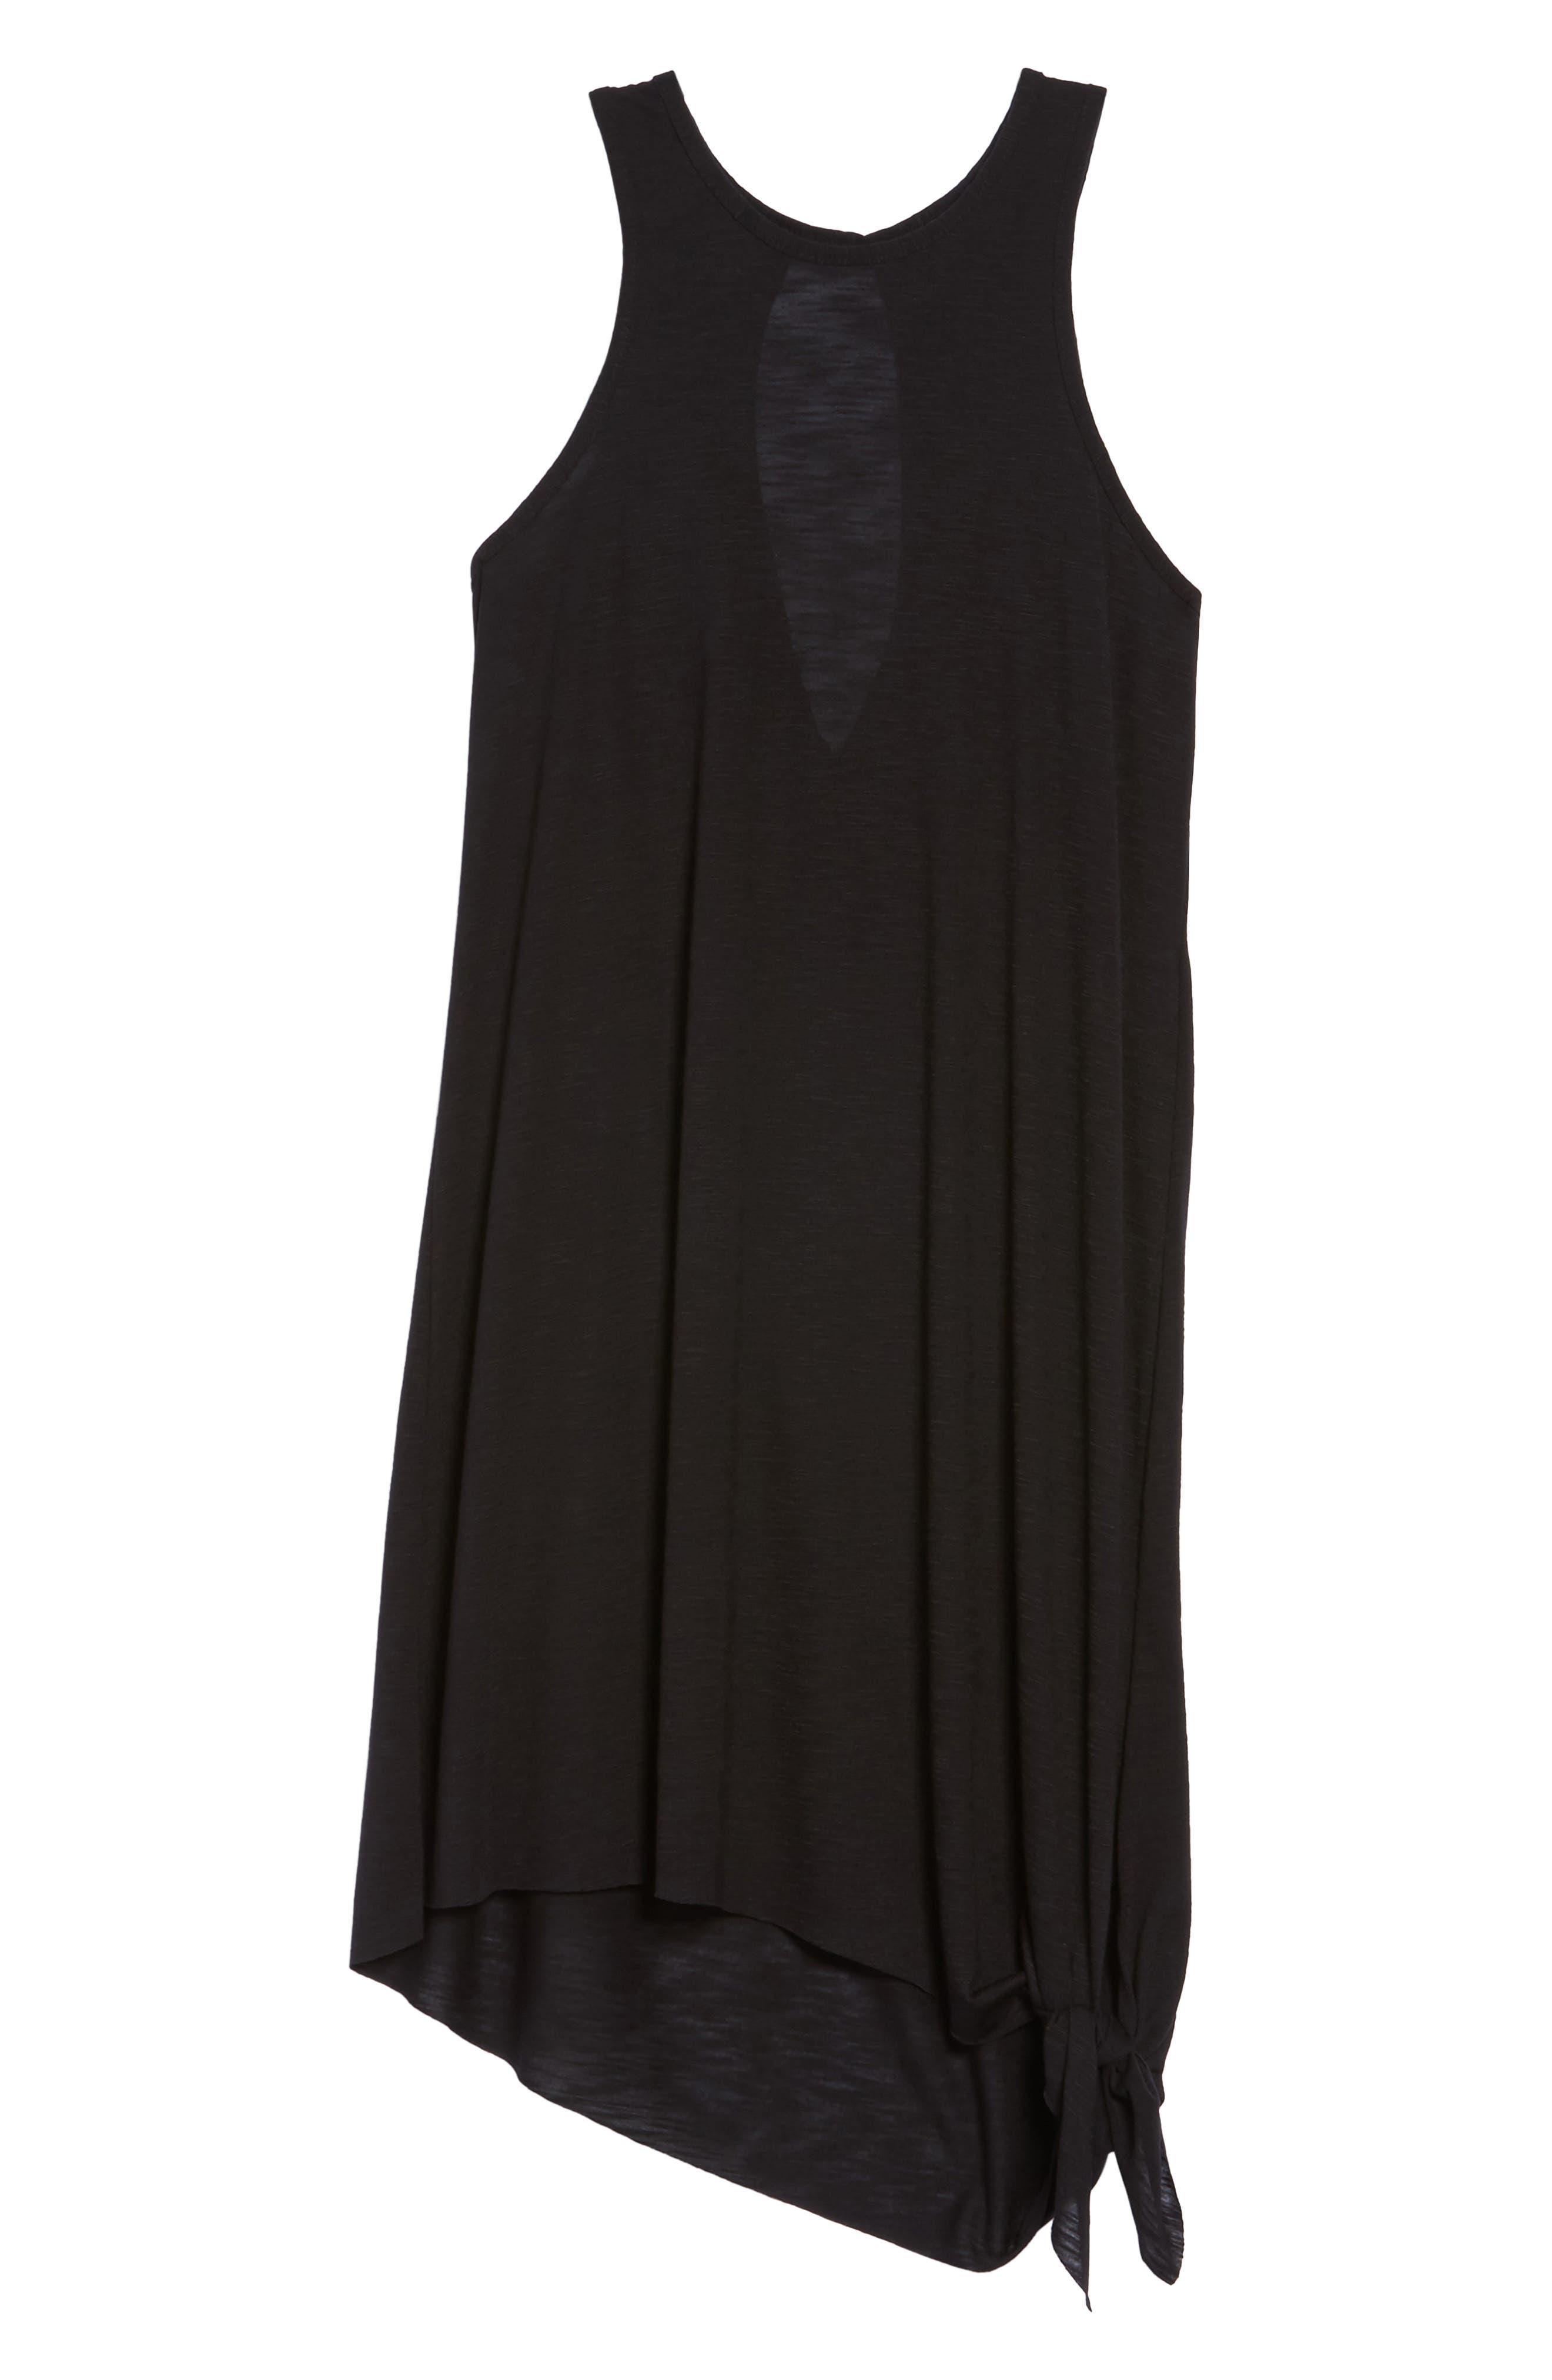 Breezy Basics Cover-Up Dress,                             Alternate thumbnail 6, color,                             BLACK